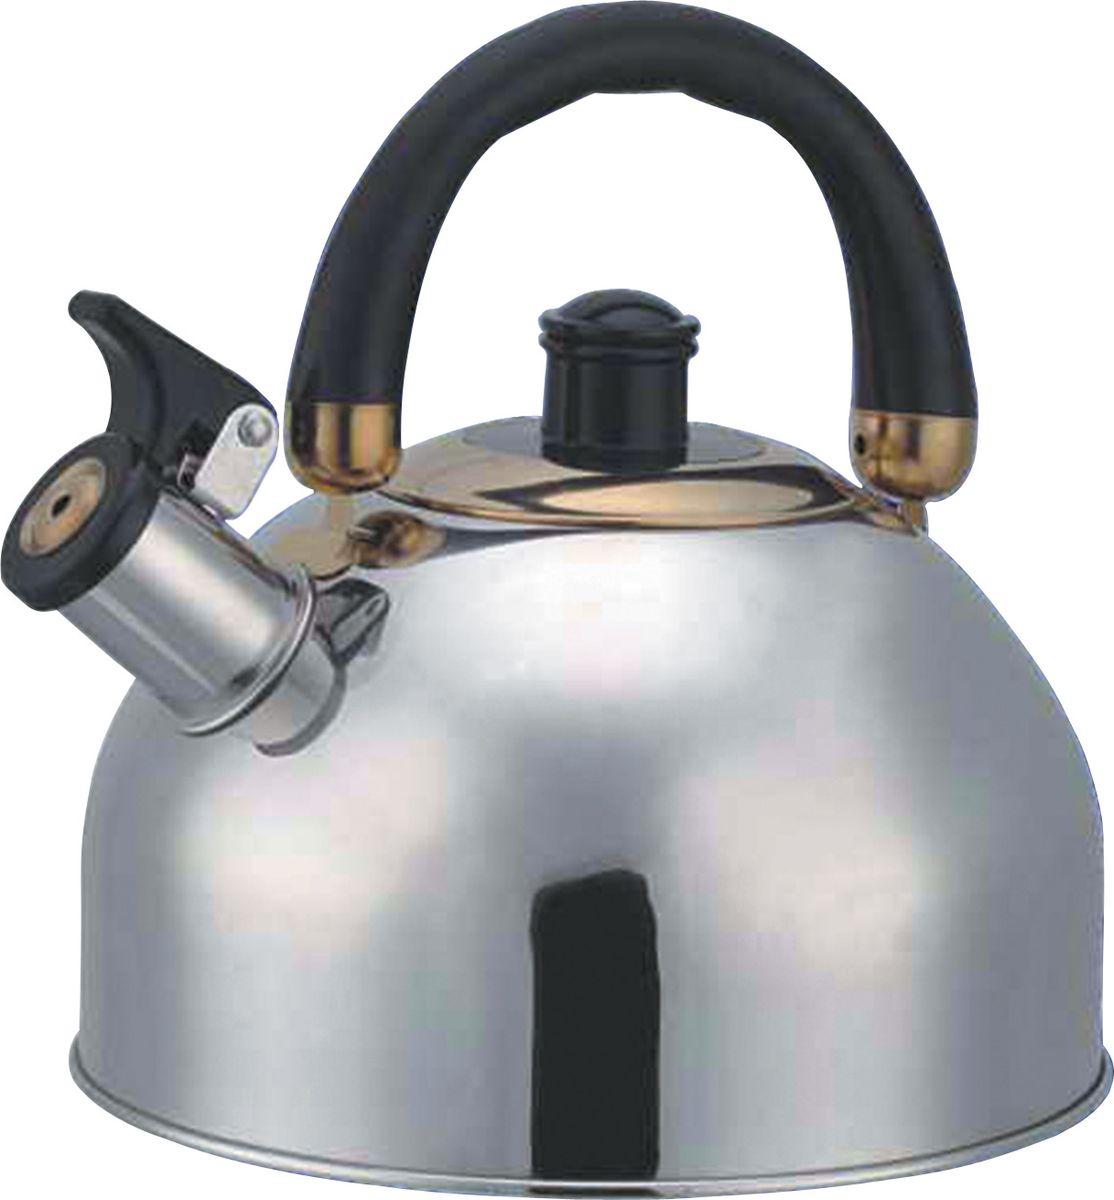 Чайник Bohmann, со свистком, 3,5 л. 635BHLBK чайник bohmann bhl 645bk